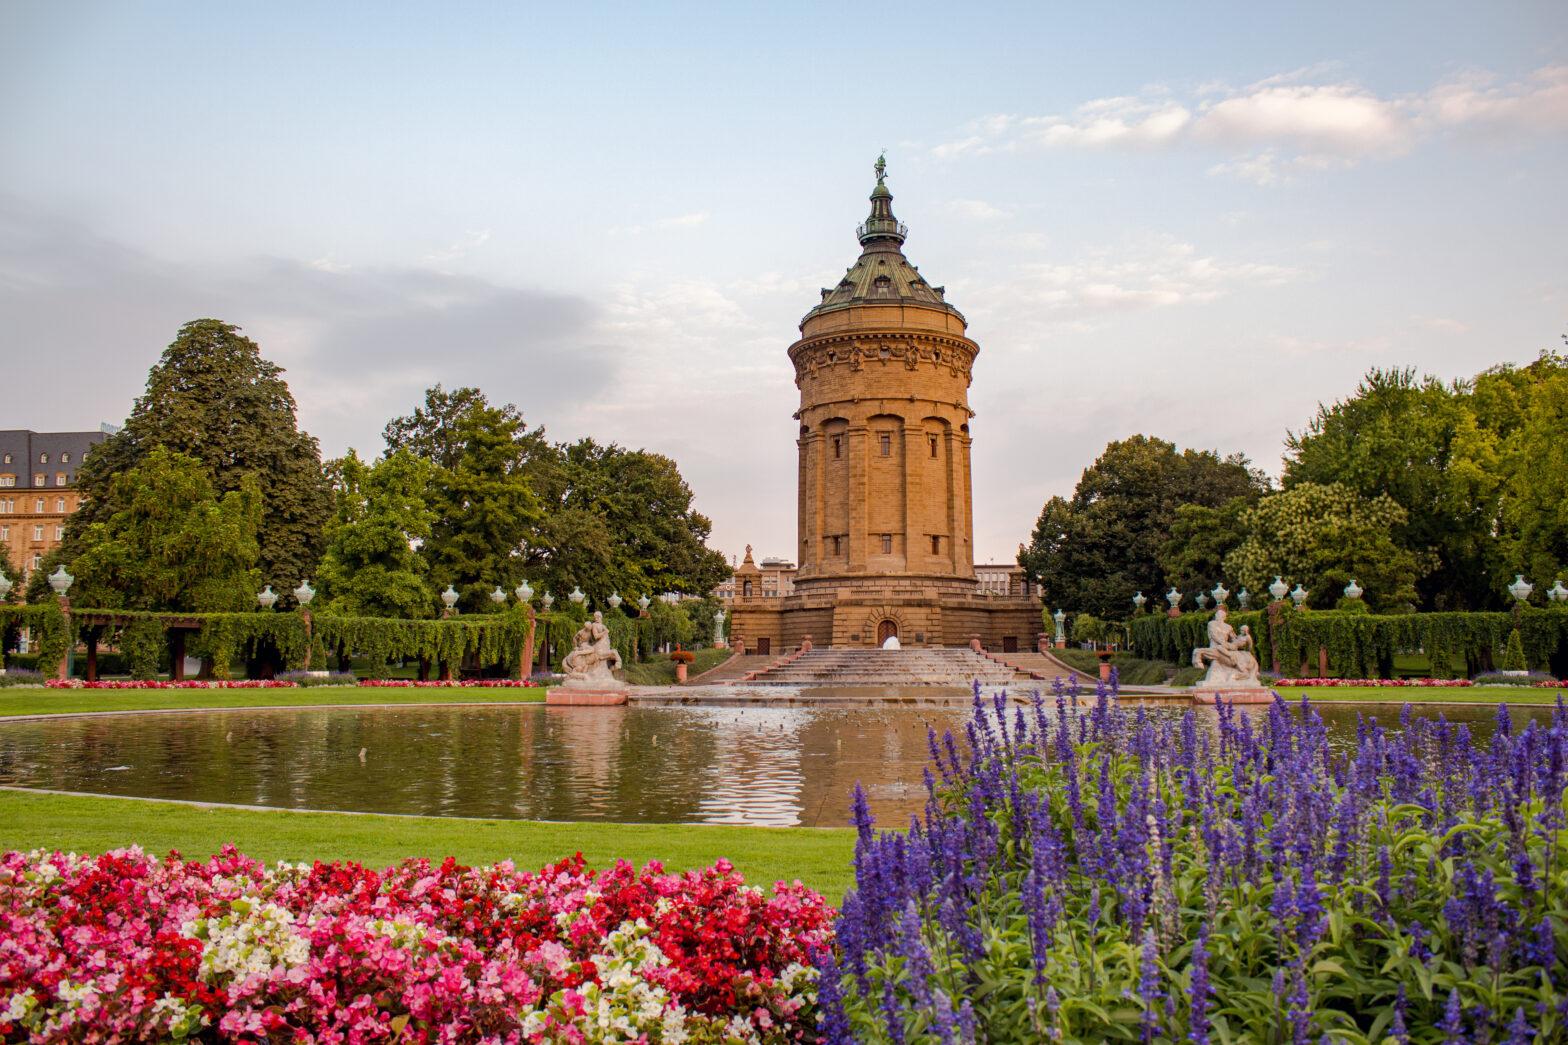 Wasserturm in Mannheim, Germany